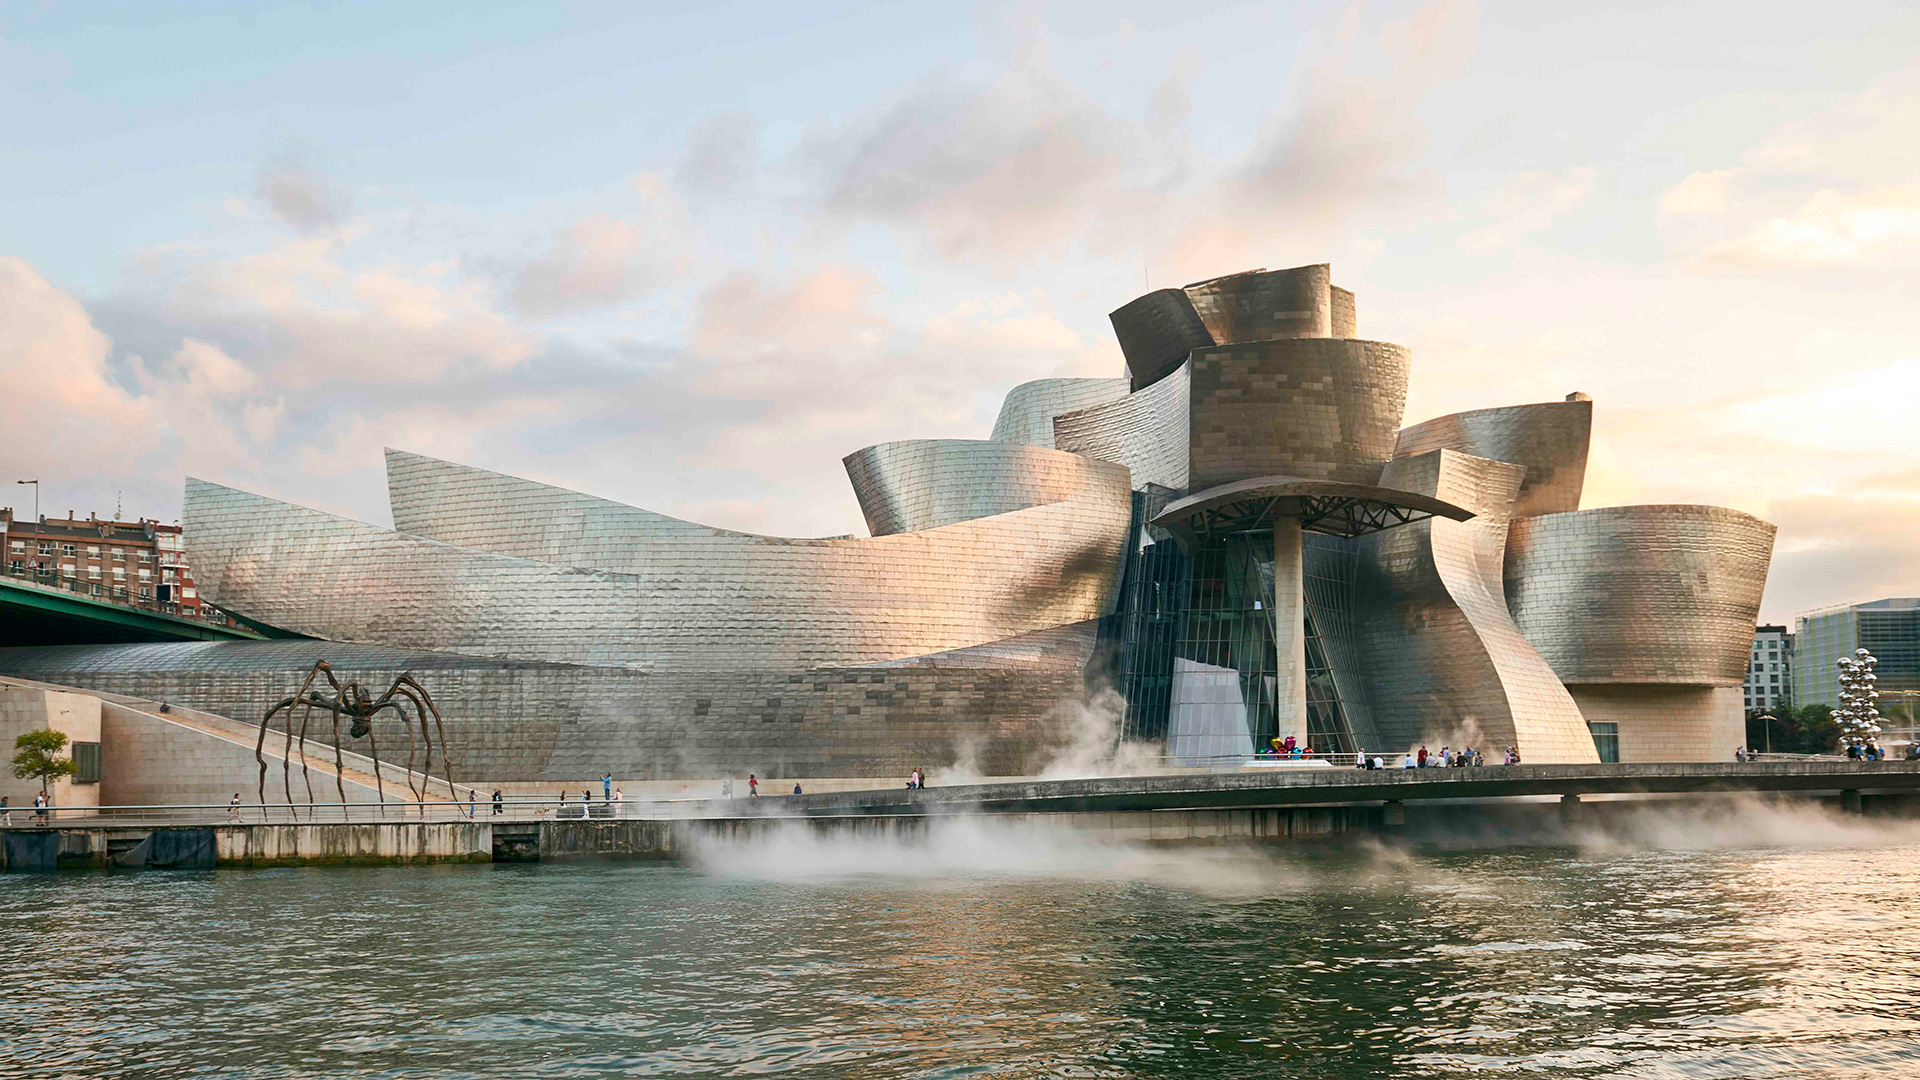 El Museo Guggenheim reabre sus puertas